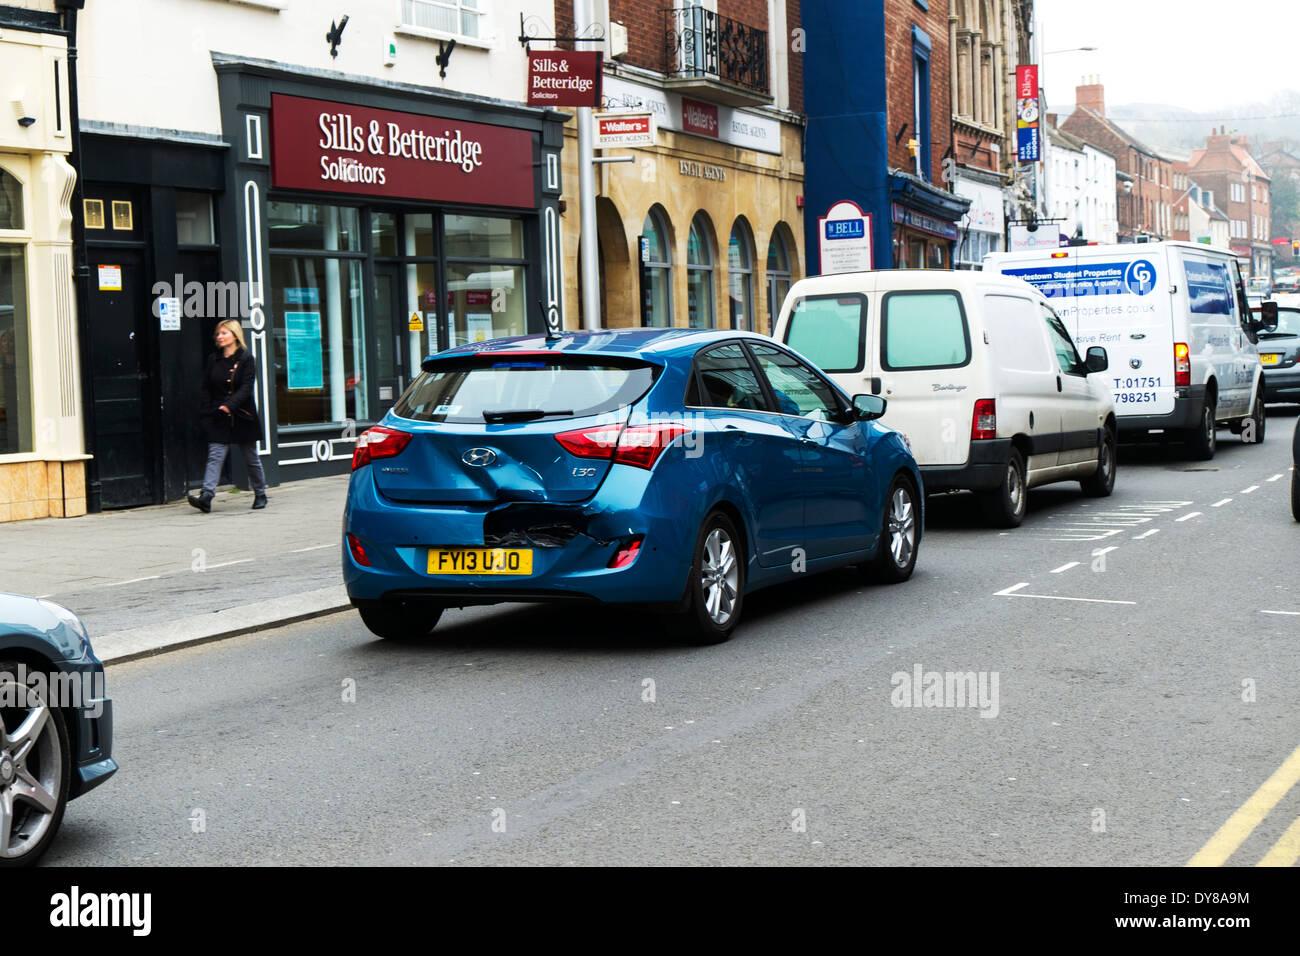 Rear Shunt Car Accident Vehicle Collision Crash Damage Car Cars